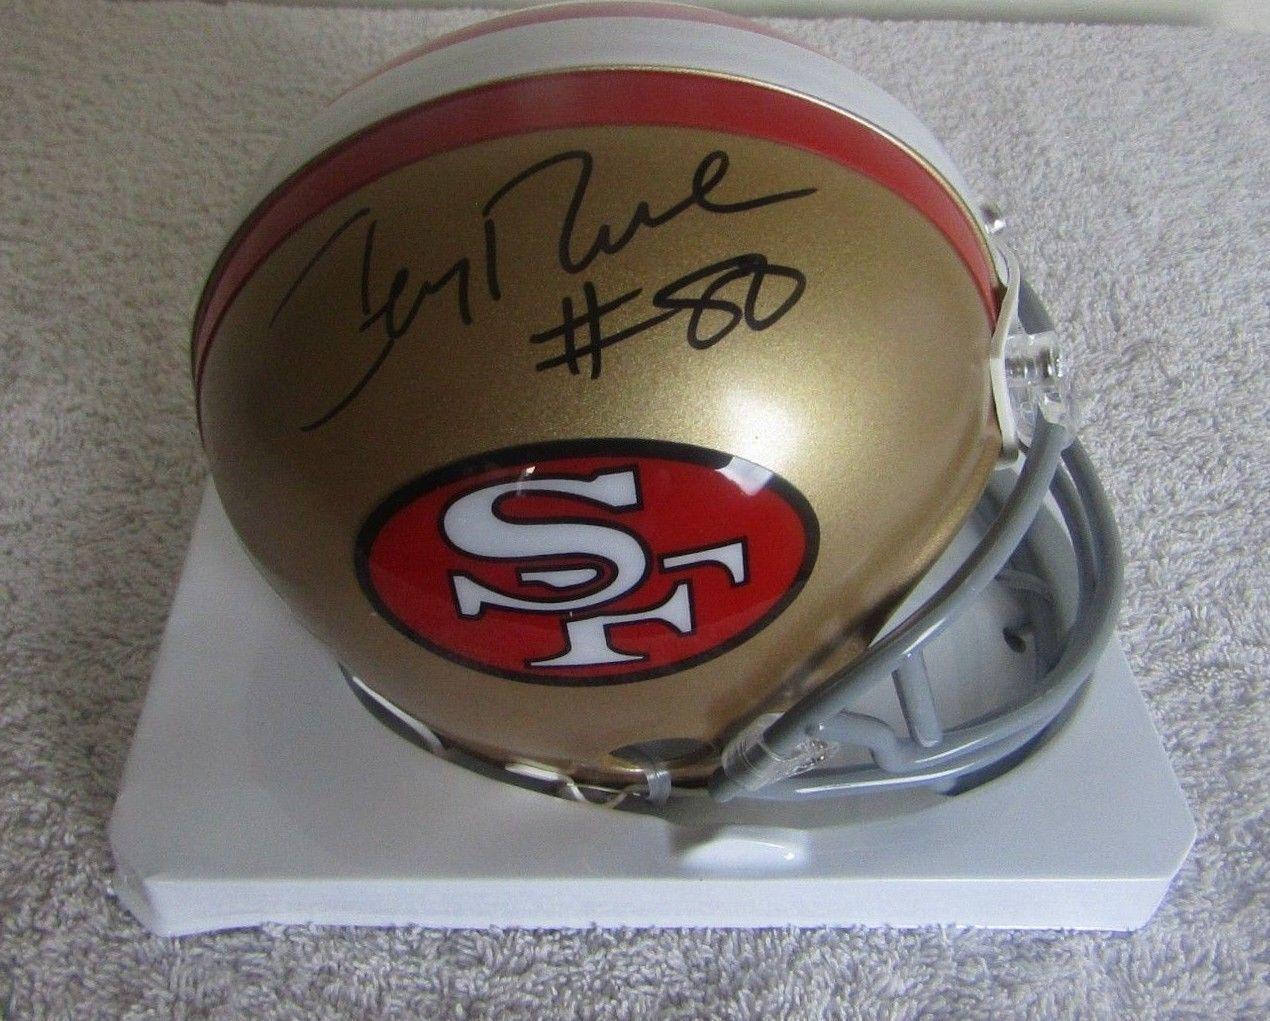 b39f829fc 57. 57. Previous. JERRY RICE AUTOGRAPHED SIGNED SAN FRANCISCO 49ers MINI  HELMET BECKETT COA